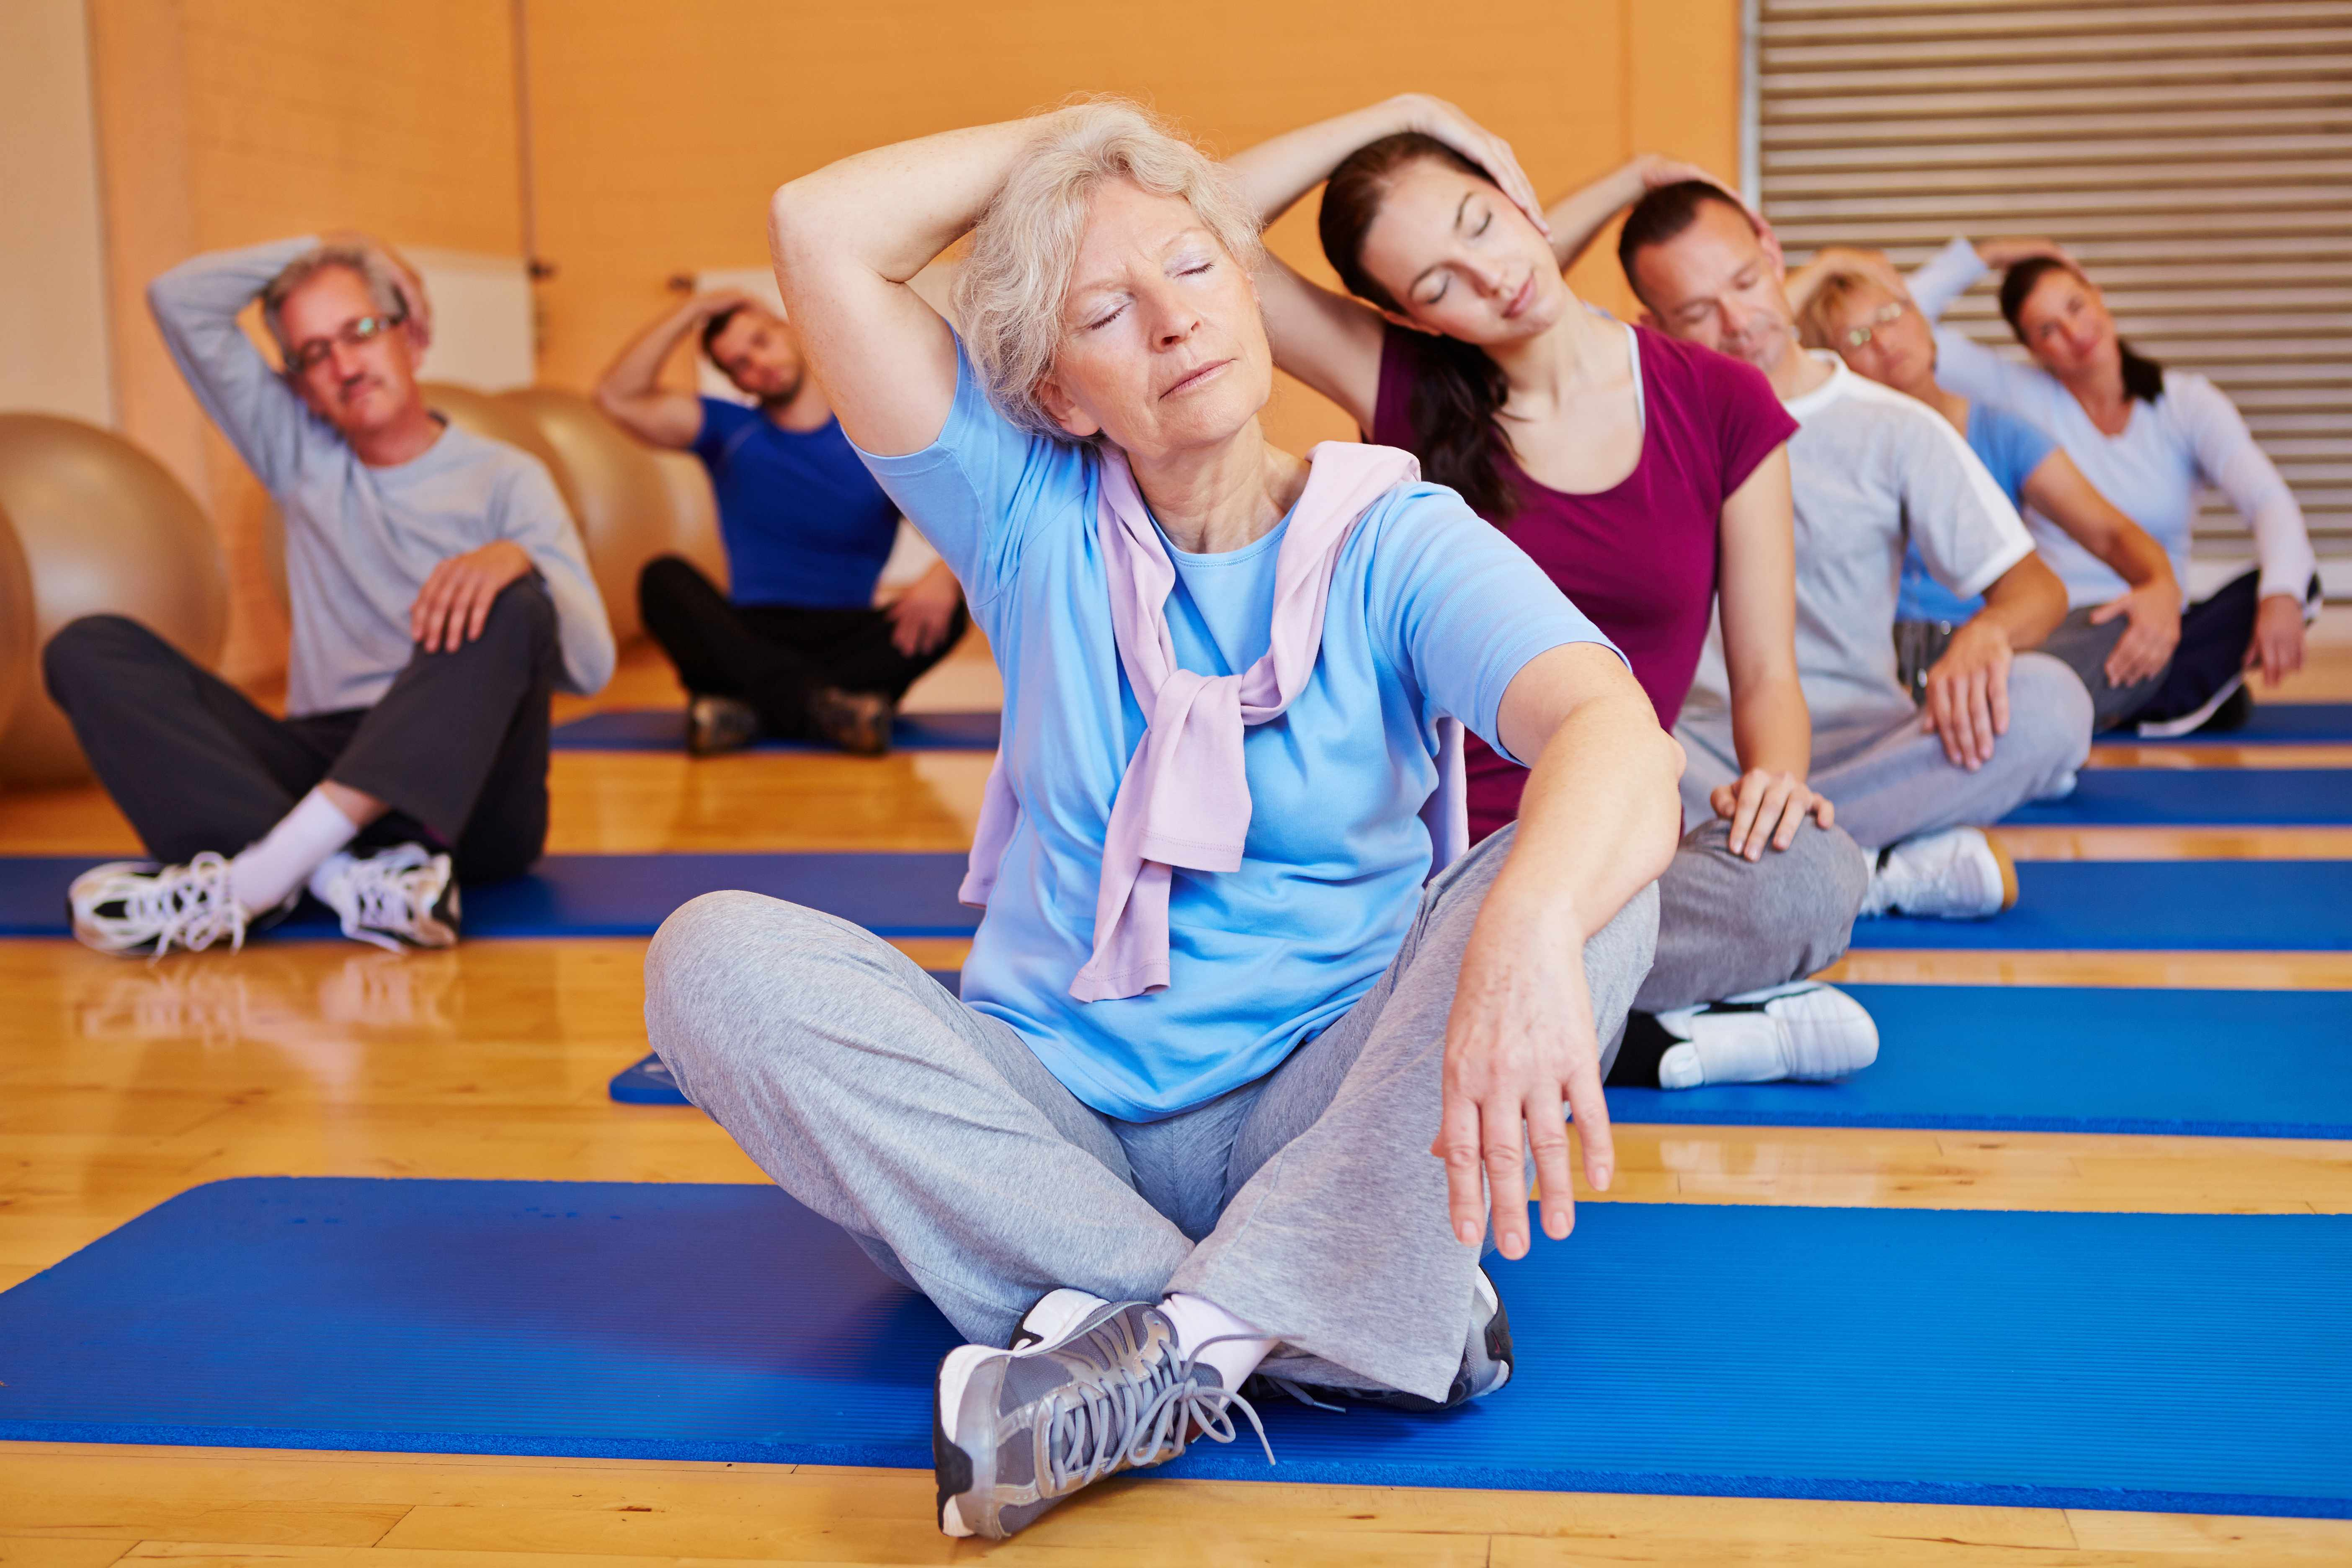 multi-generational exercise class doing yoga